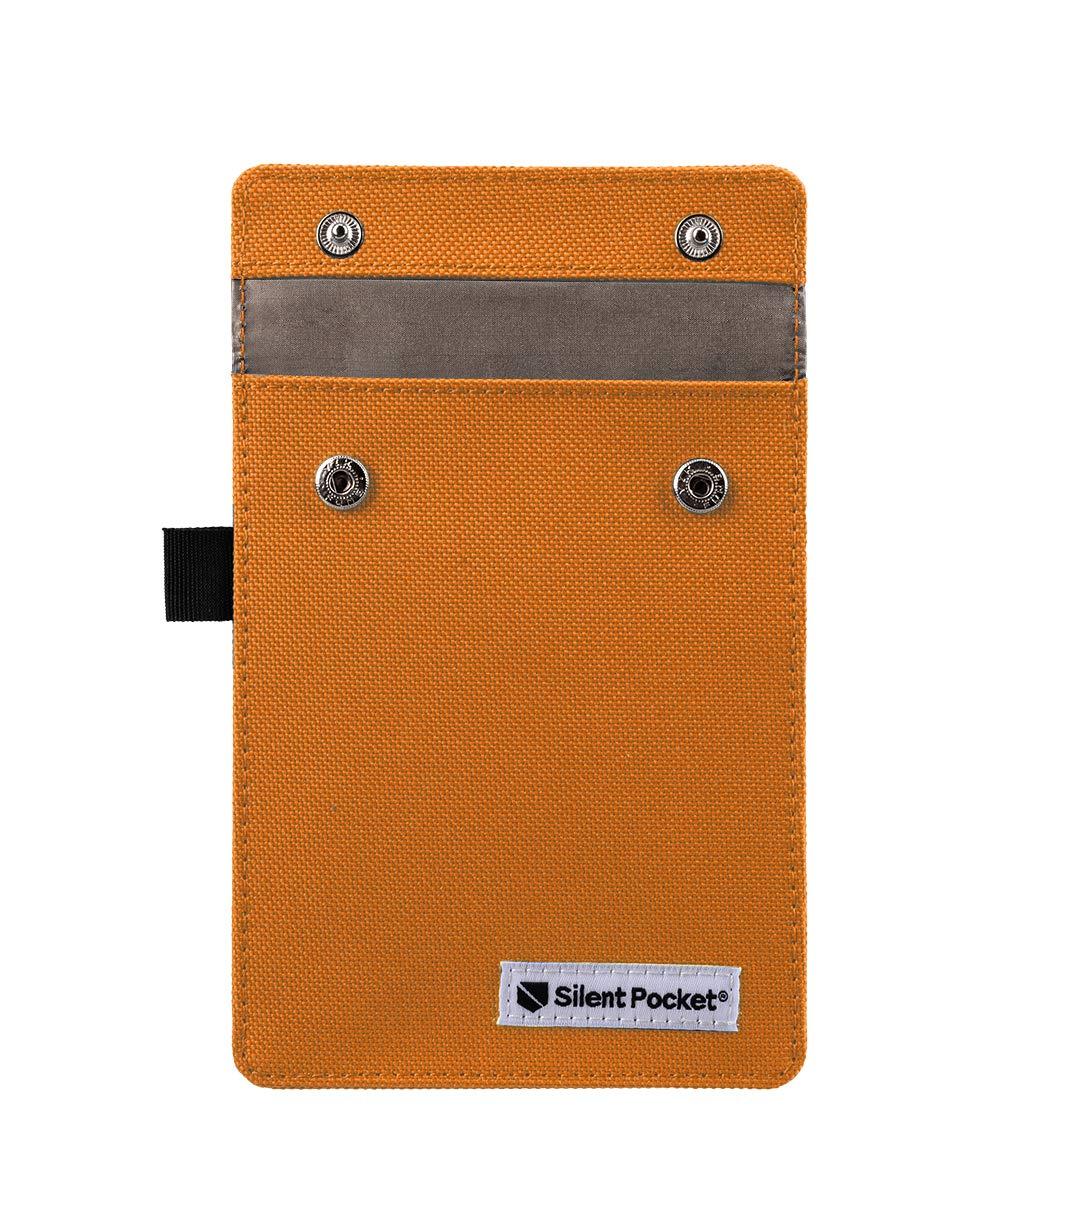 Fits Most Car Keyfobs Silent Pocket Signal Blocking Faraday Key Fob Case Olive Including RFID Blocking /& Durable Faraday Bag Car Anti Theft Device Shielding Against All Signal Types